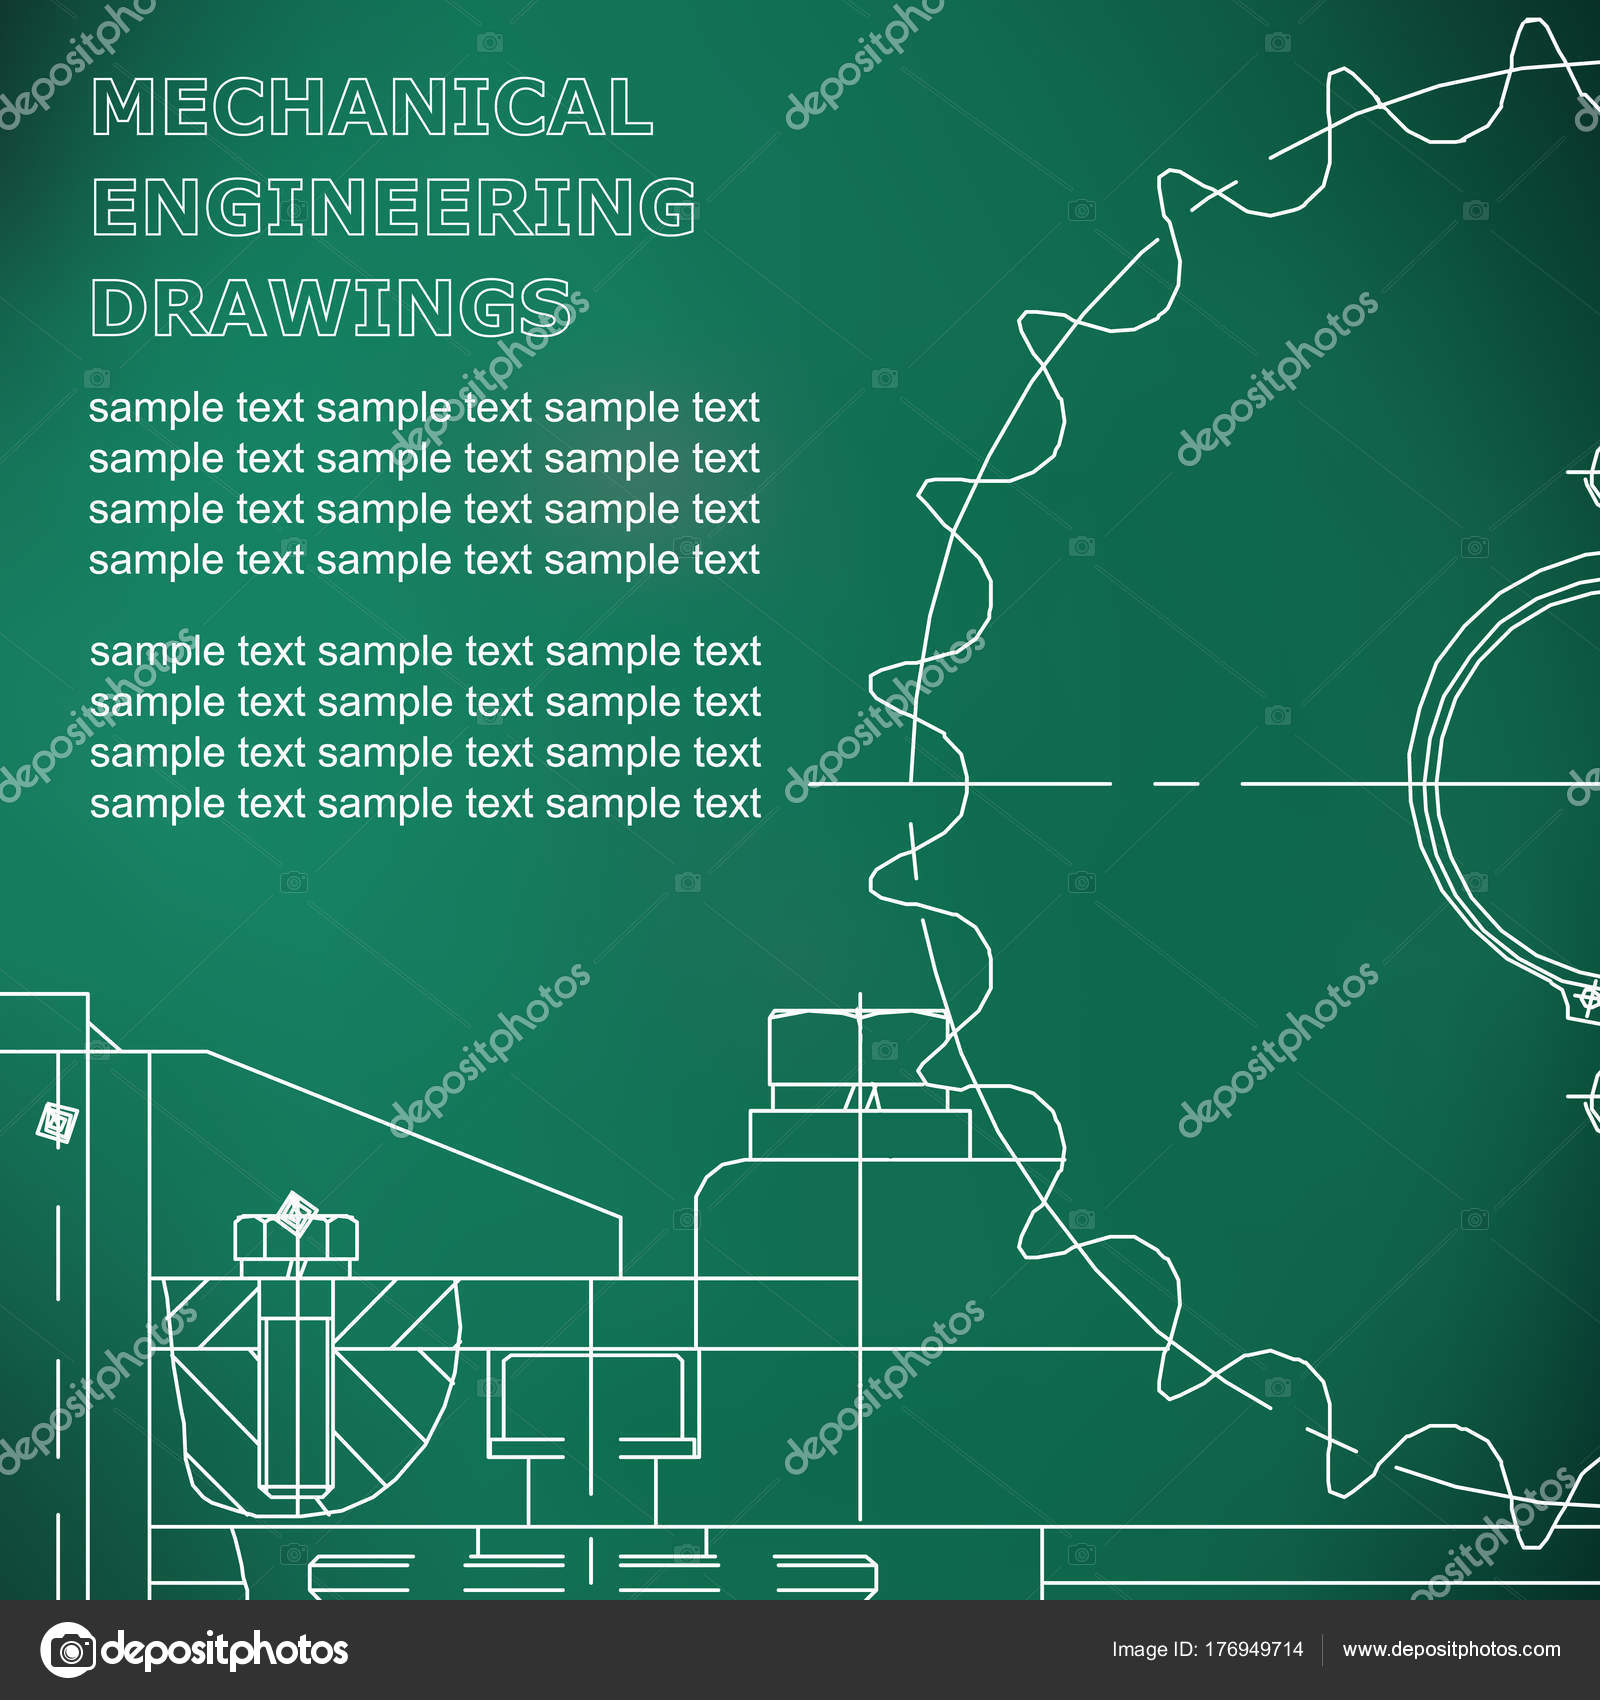 Maschinenbau Zeichnen Vektor Hellgrün — Stockvektor © Bubushonok ...